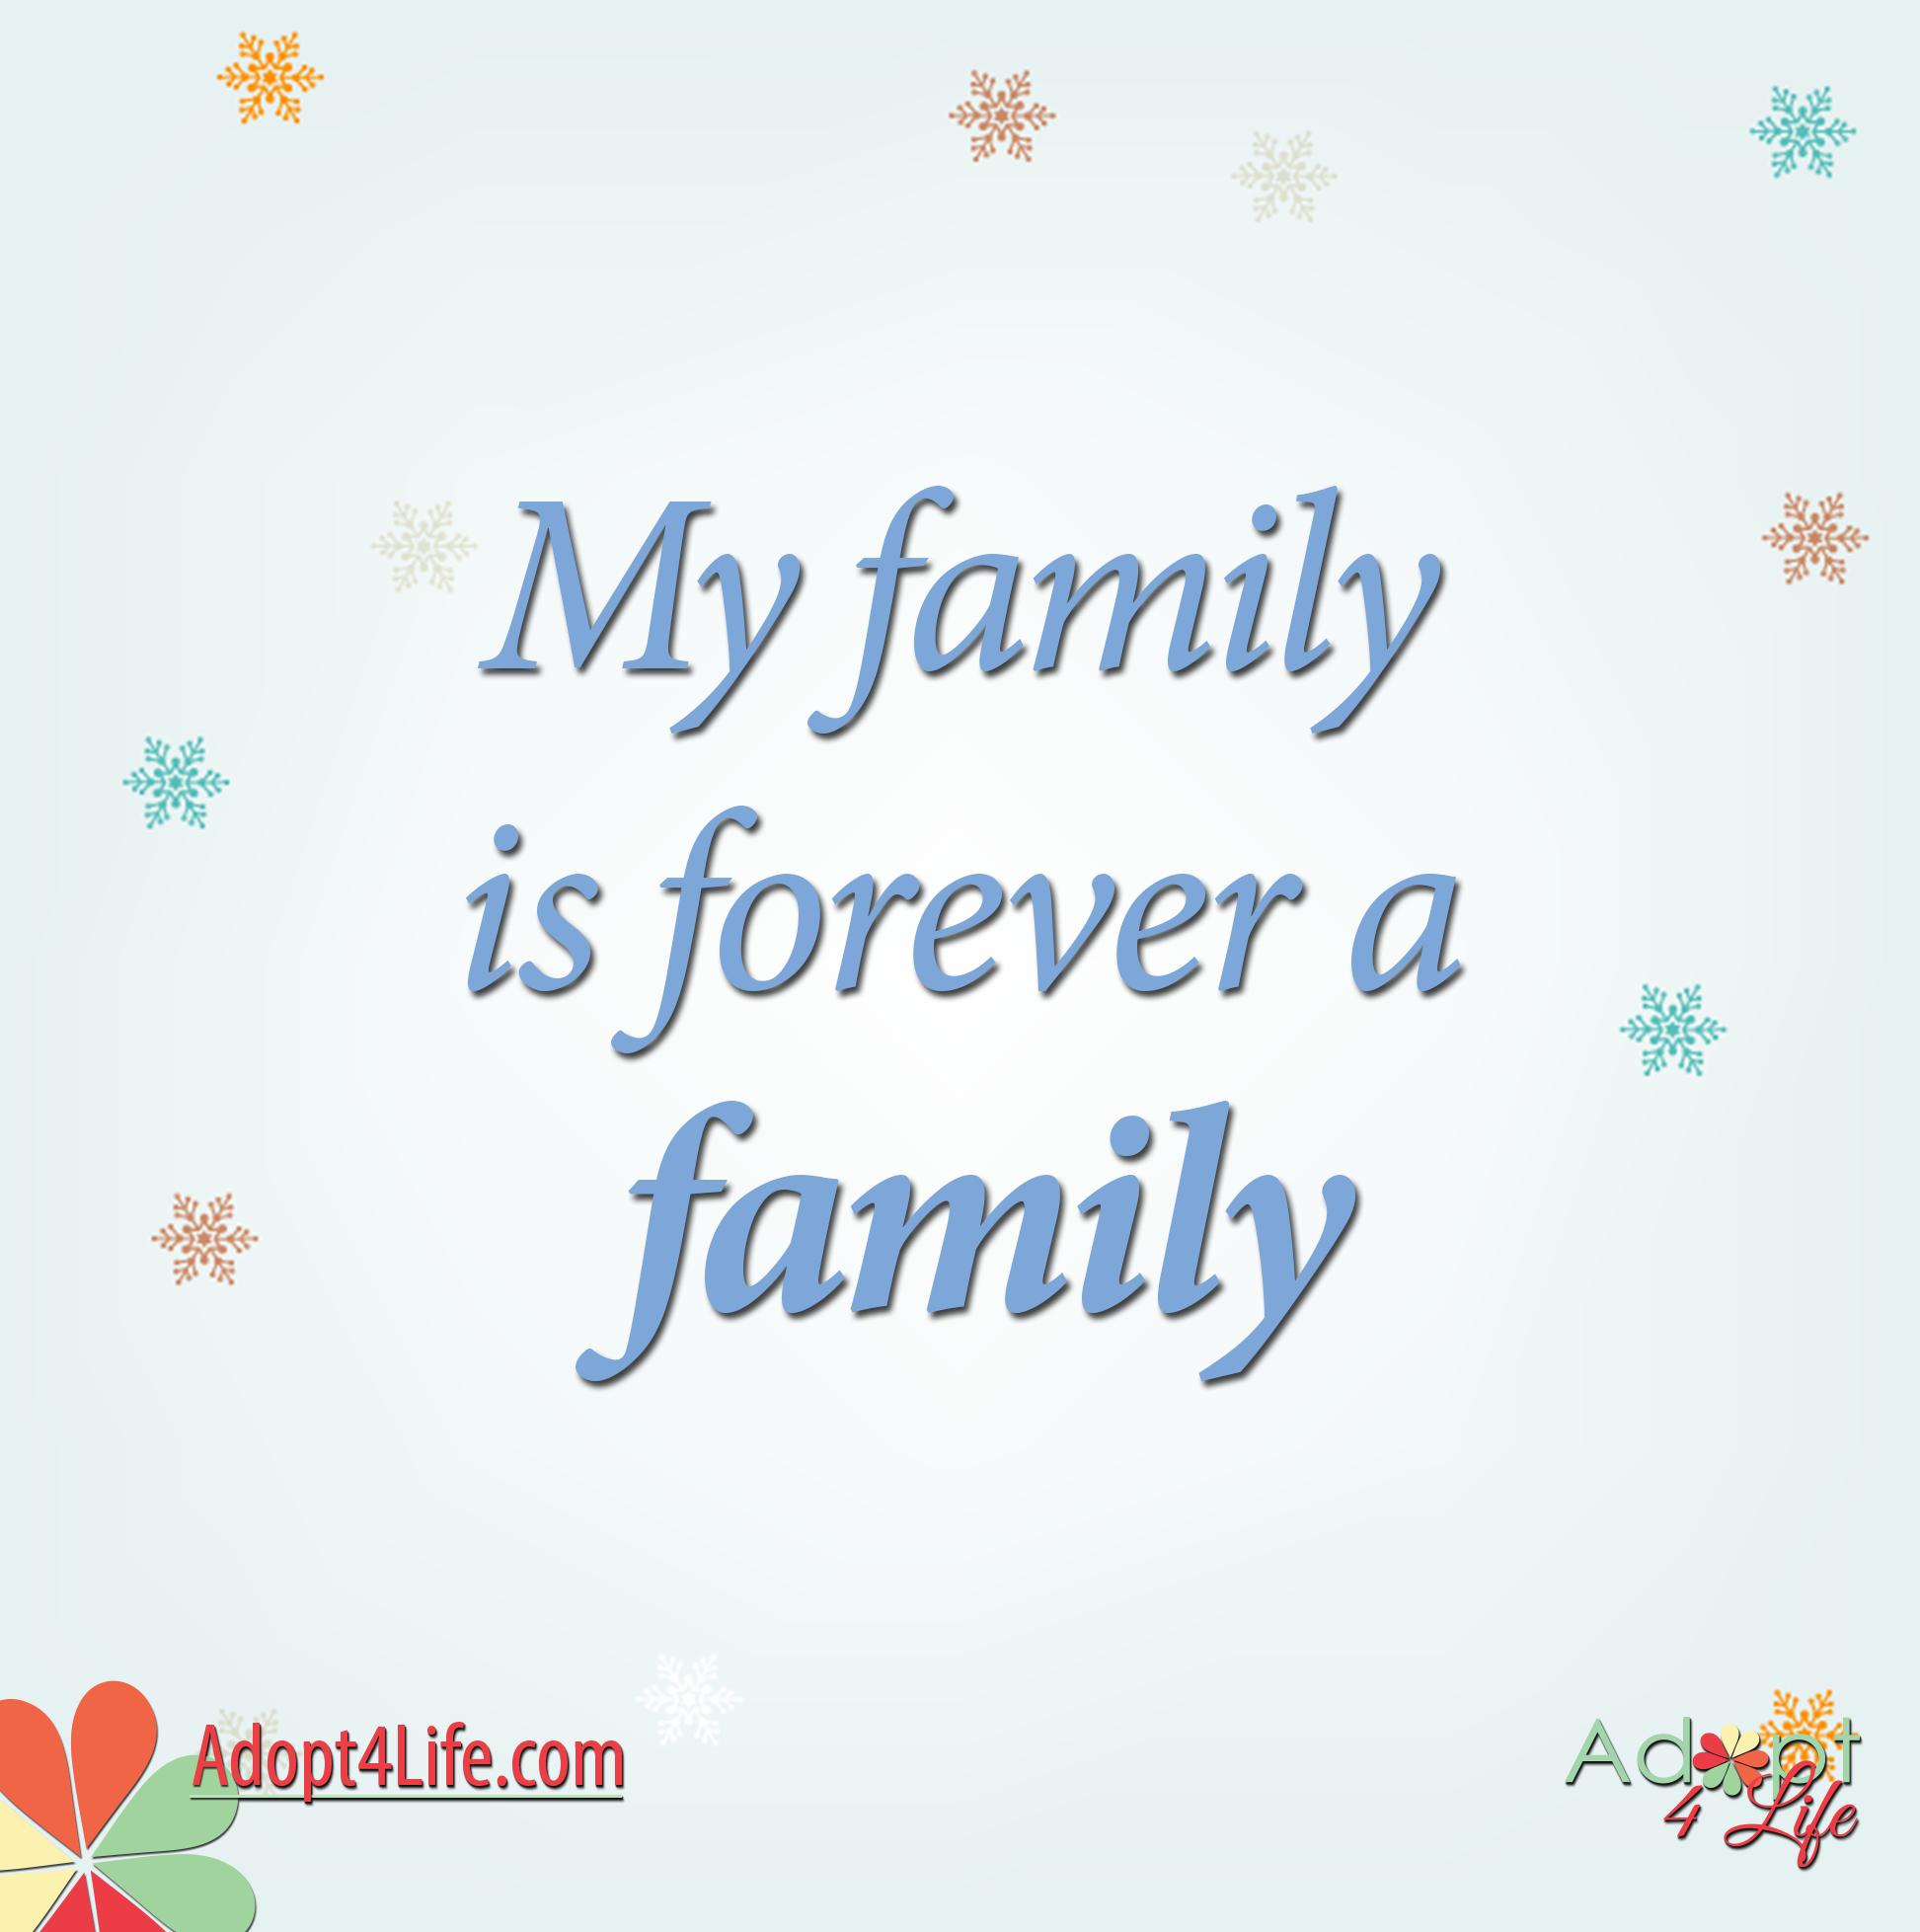 FacebookAdoptionQuotes_Adoption_022_png_Dec2014.png